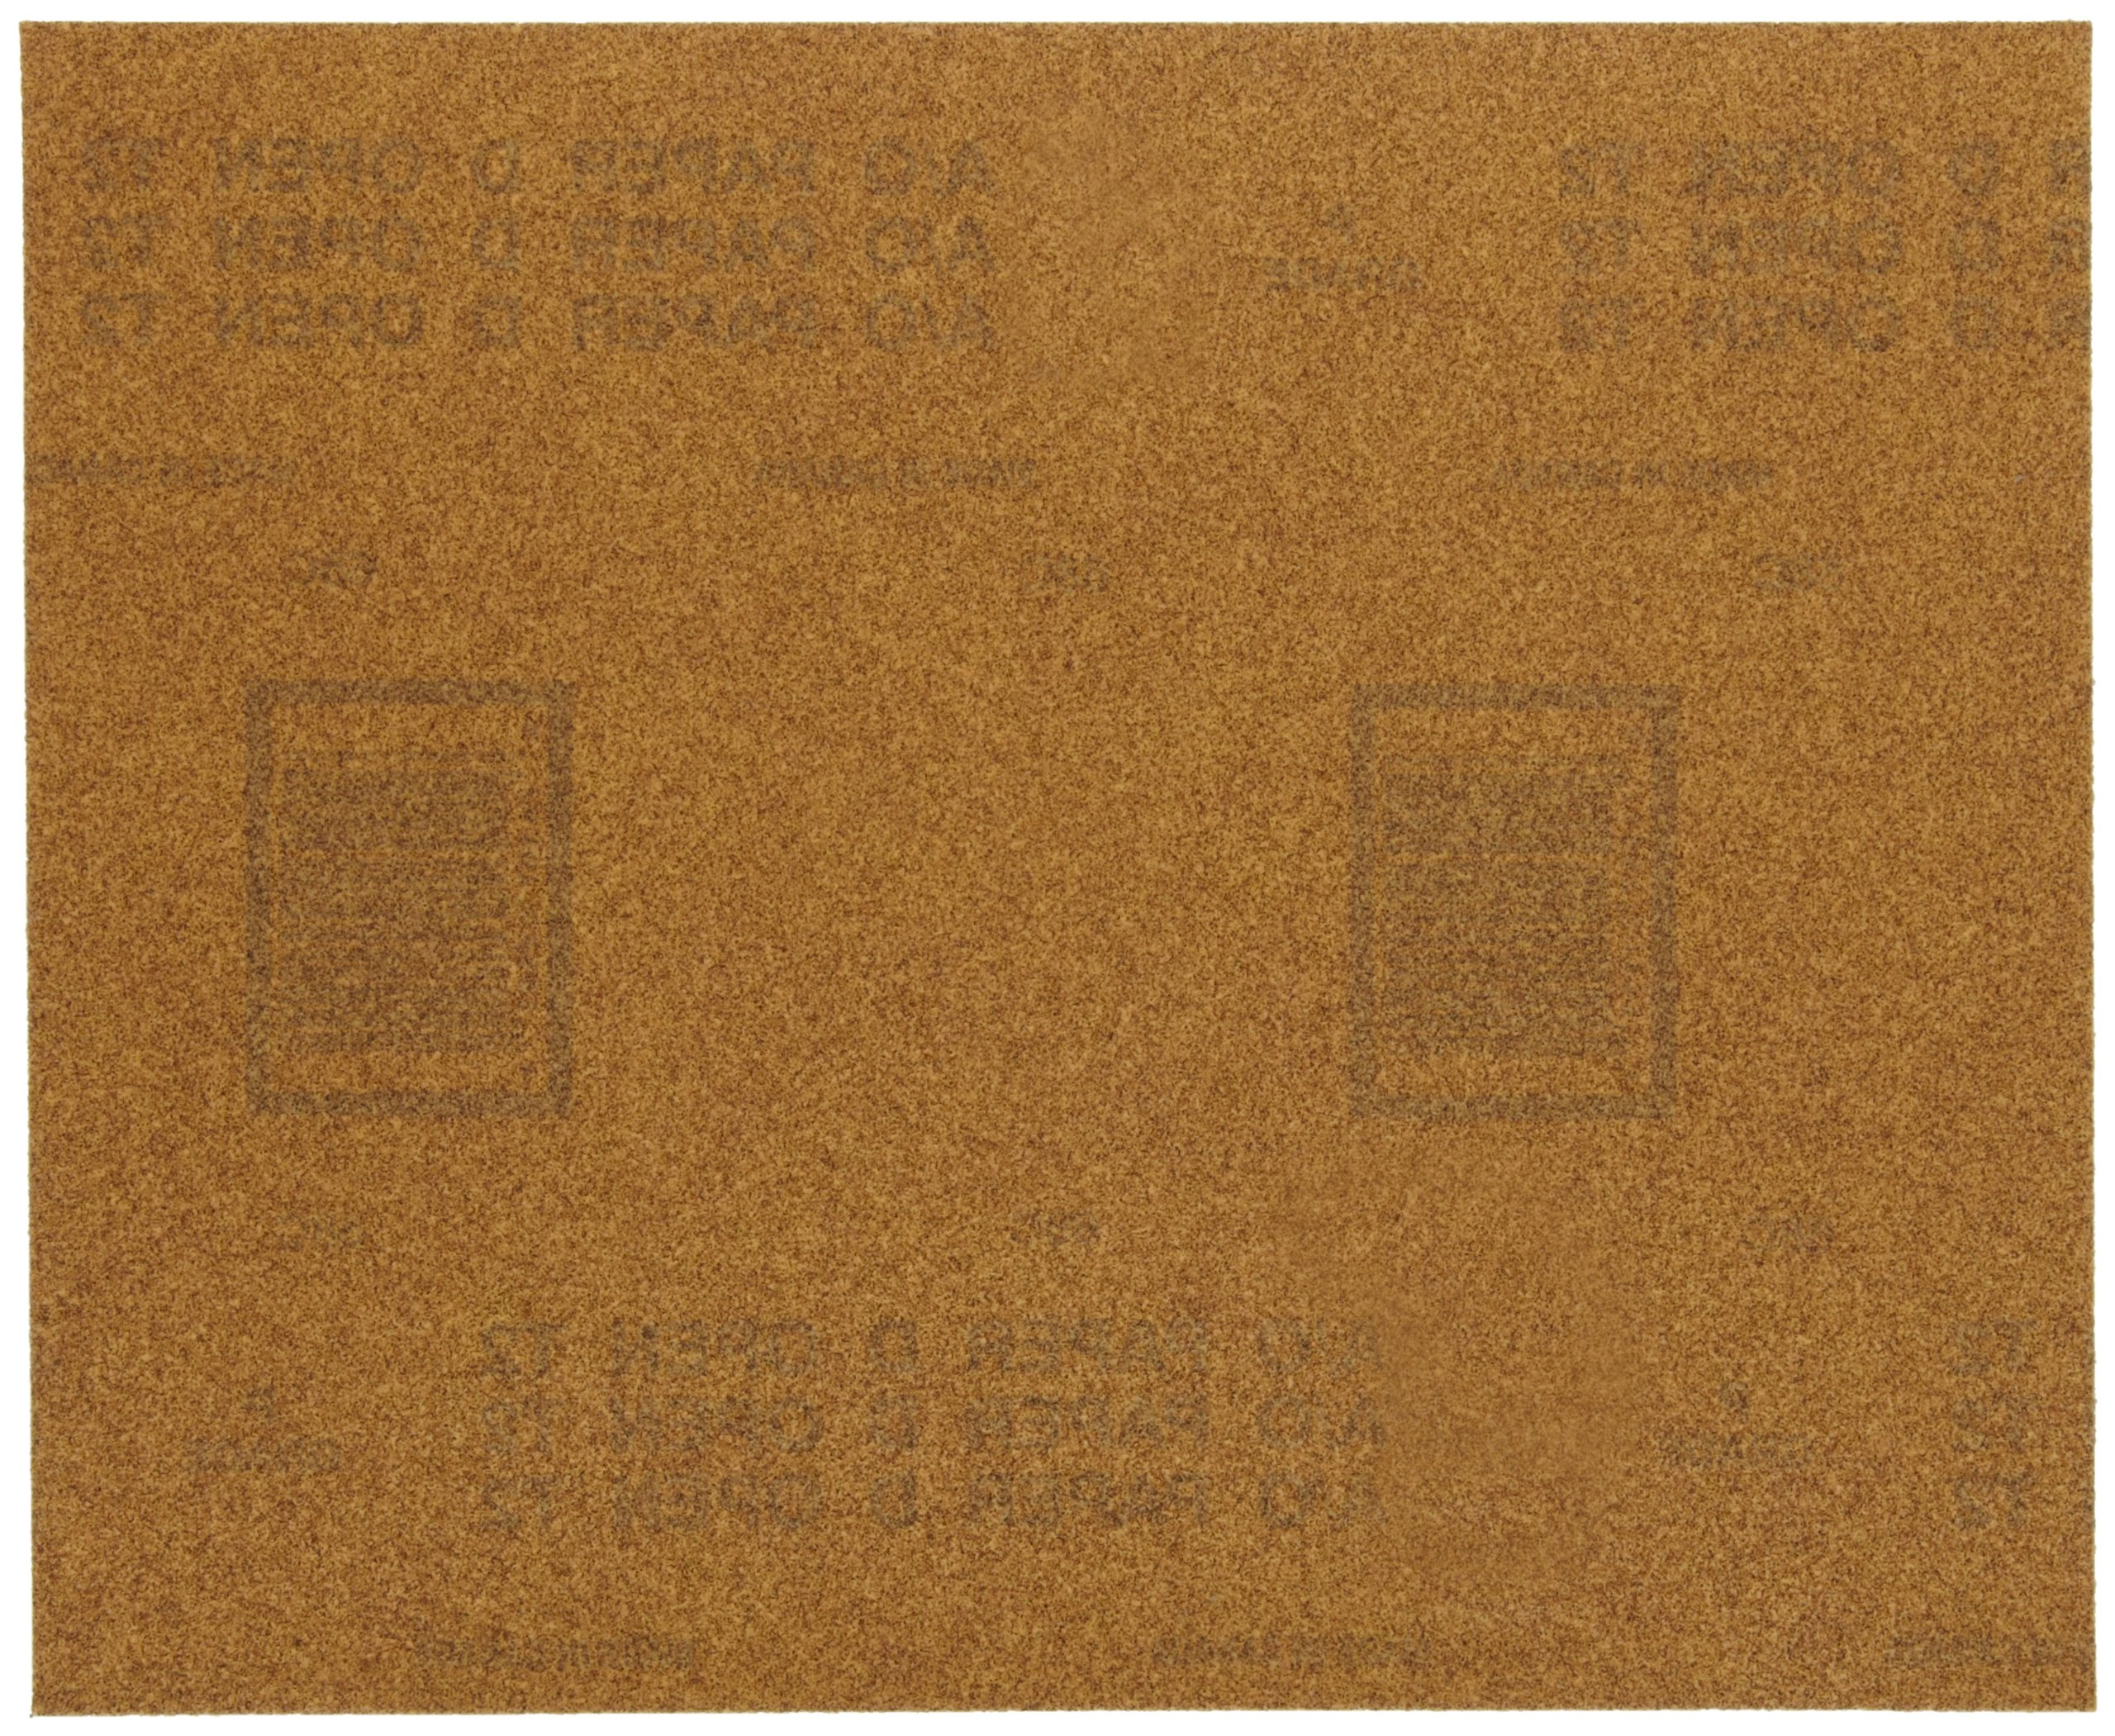 Norton Multisand Job Pack Abrasive Sheet, Paper Backing, Aluminum Oxide, Grit P180 (Pack of 25)